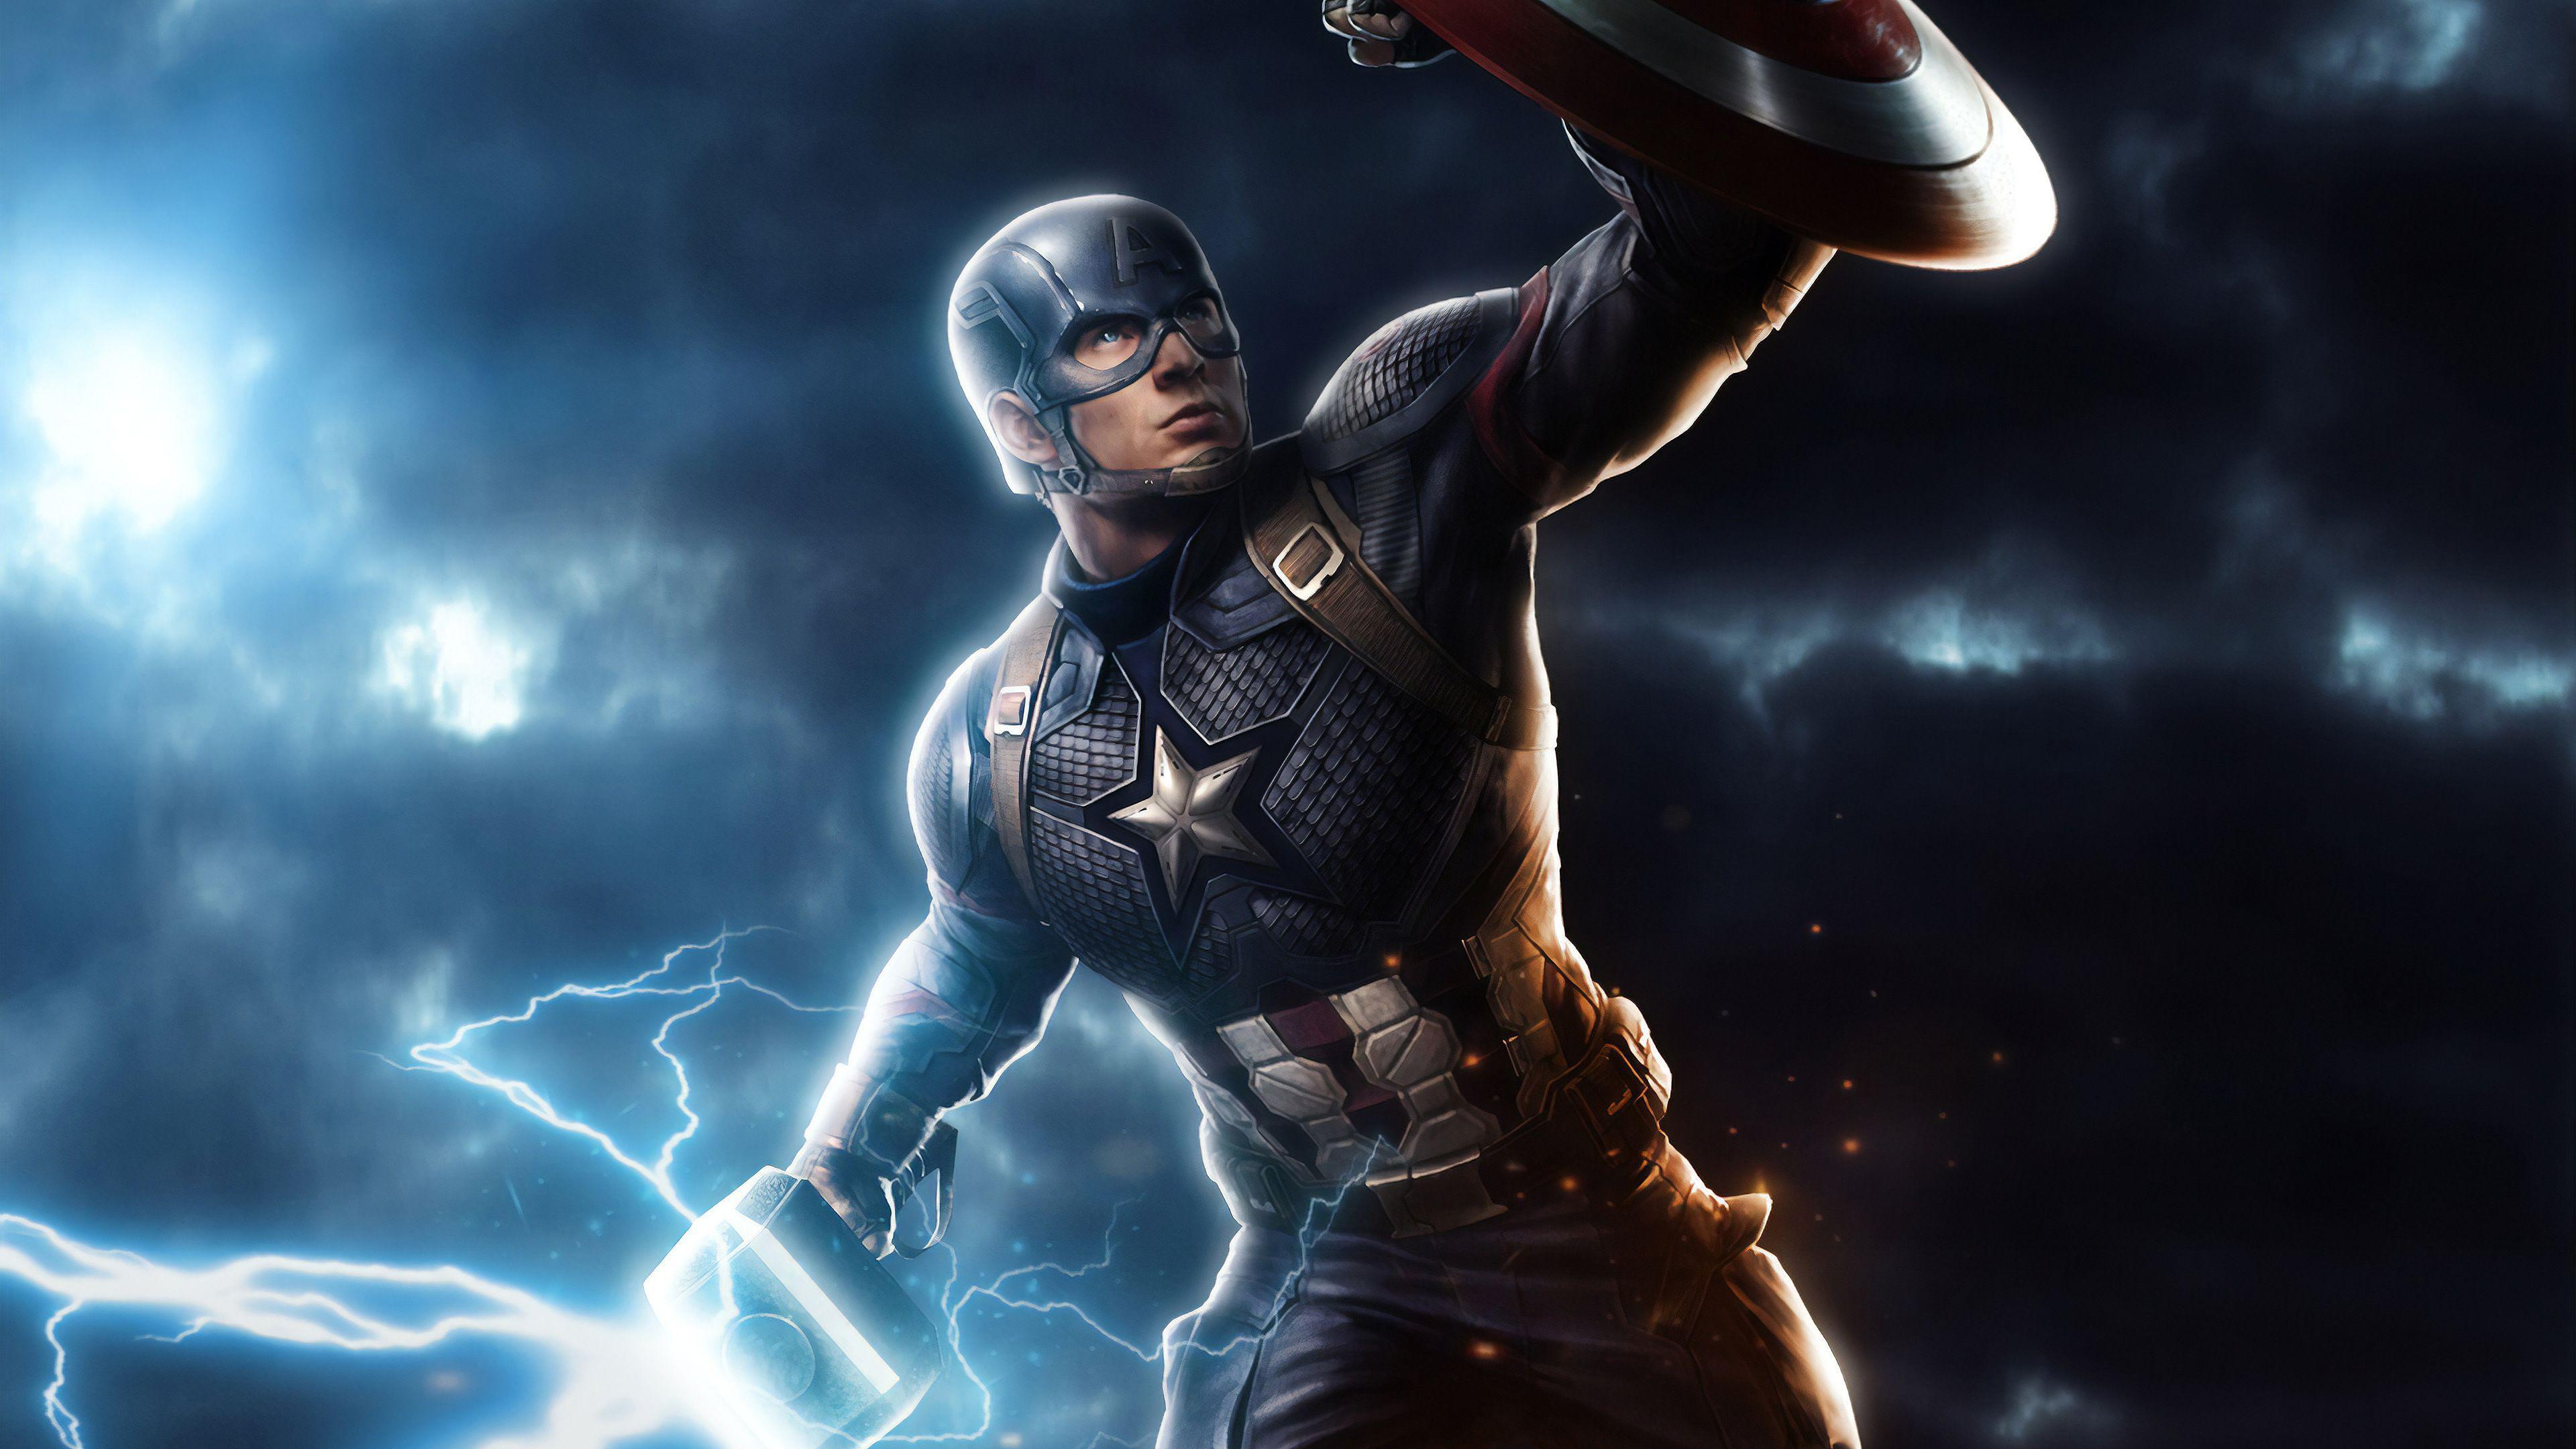 Captain America Mjolnir Wallpapers Top Free Captain America